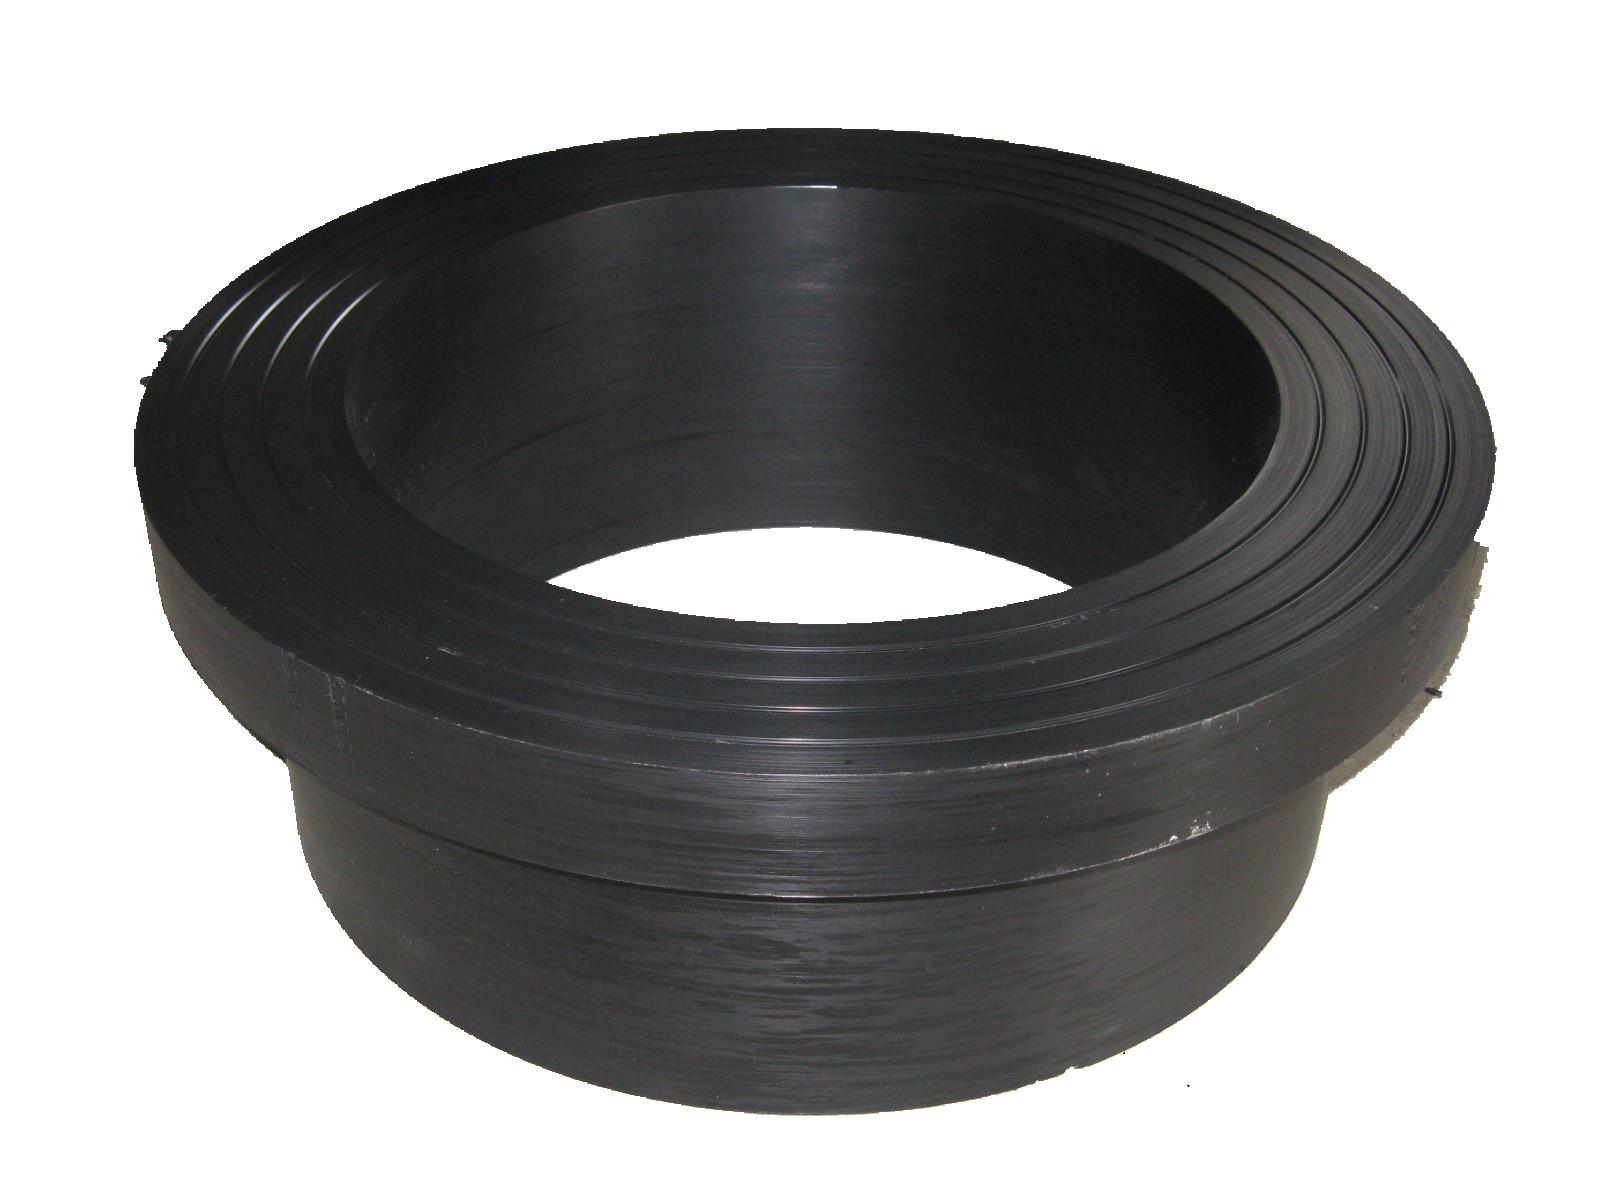 Customizable large diameter HDPE flange 3